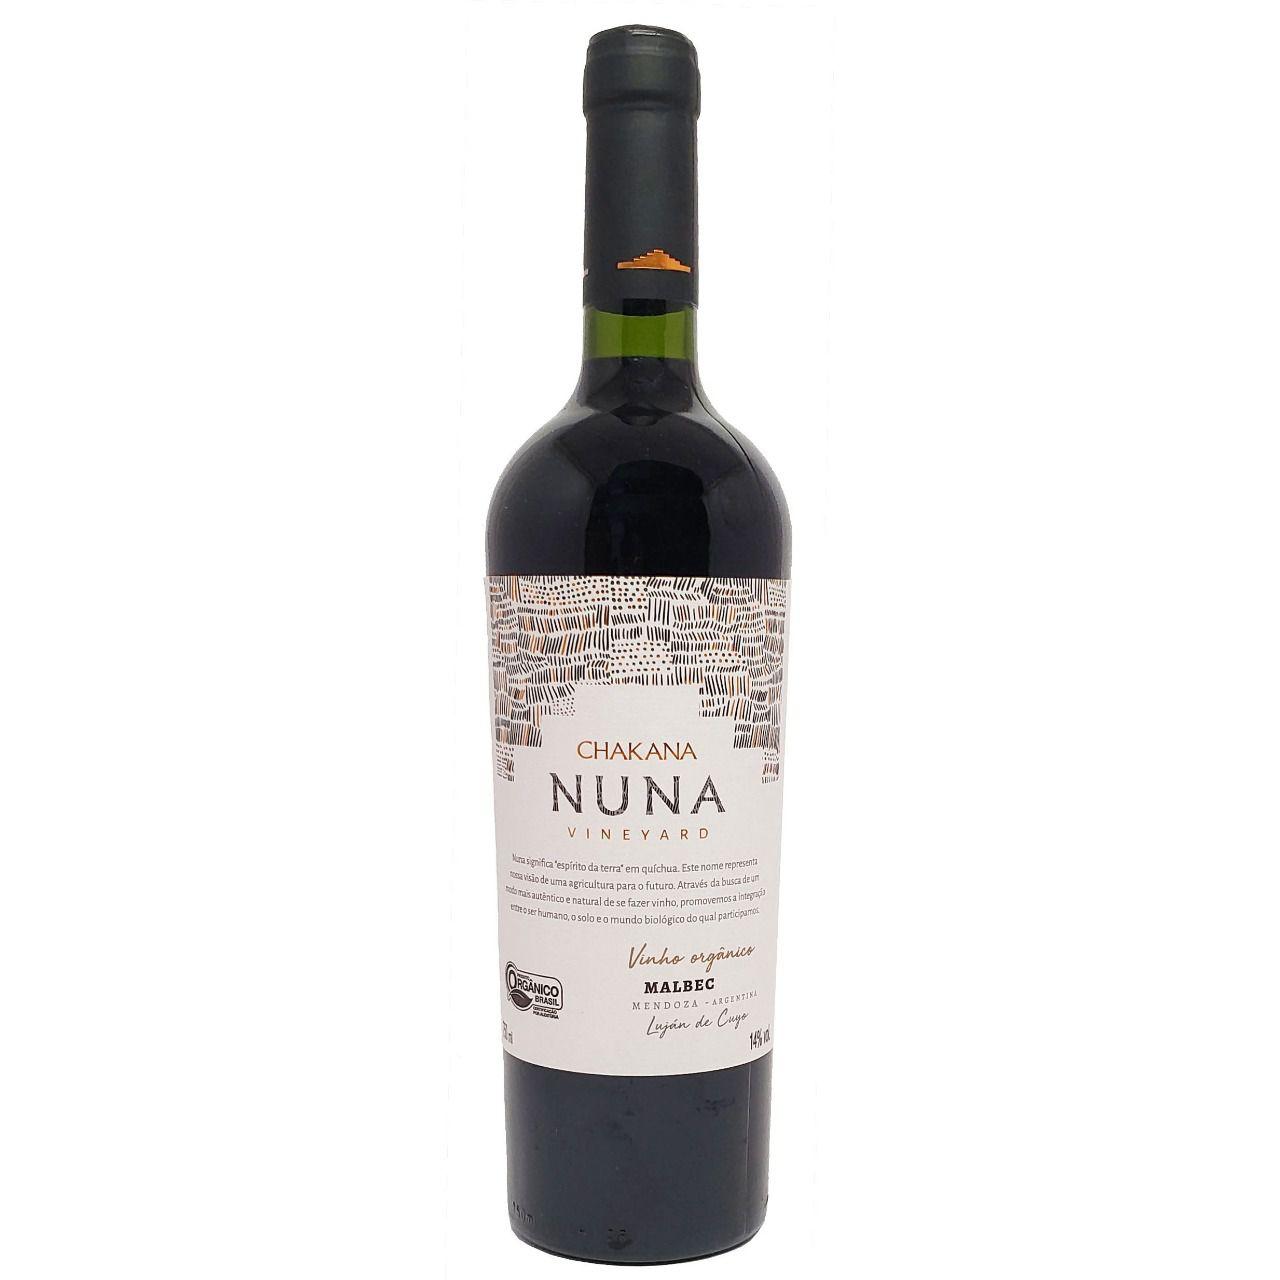 Vinho Tinto Orgânico Chakana Nuna Vineyard Malbec - 750ml -